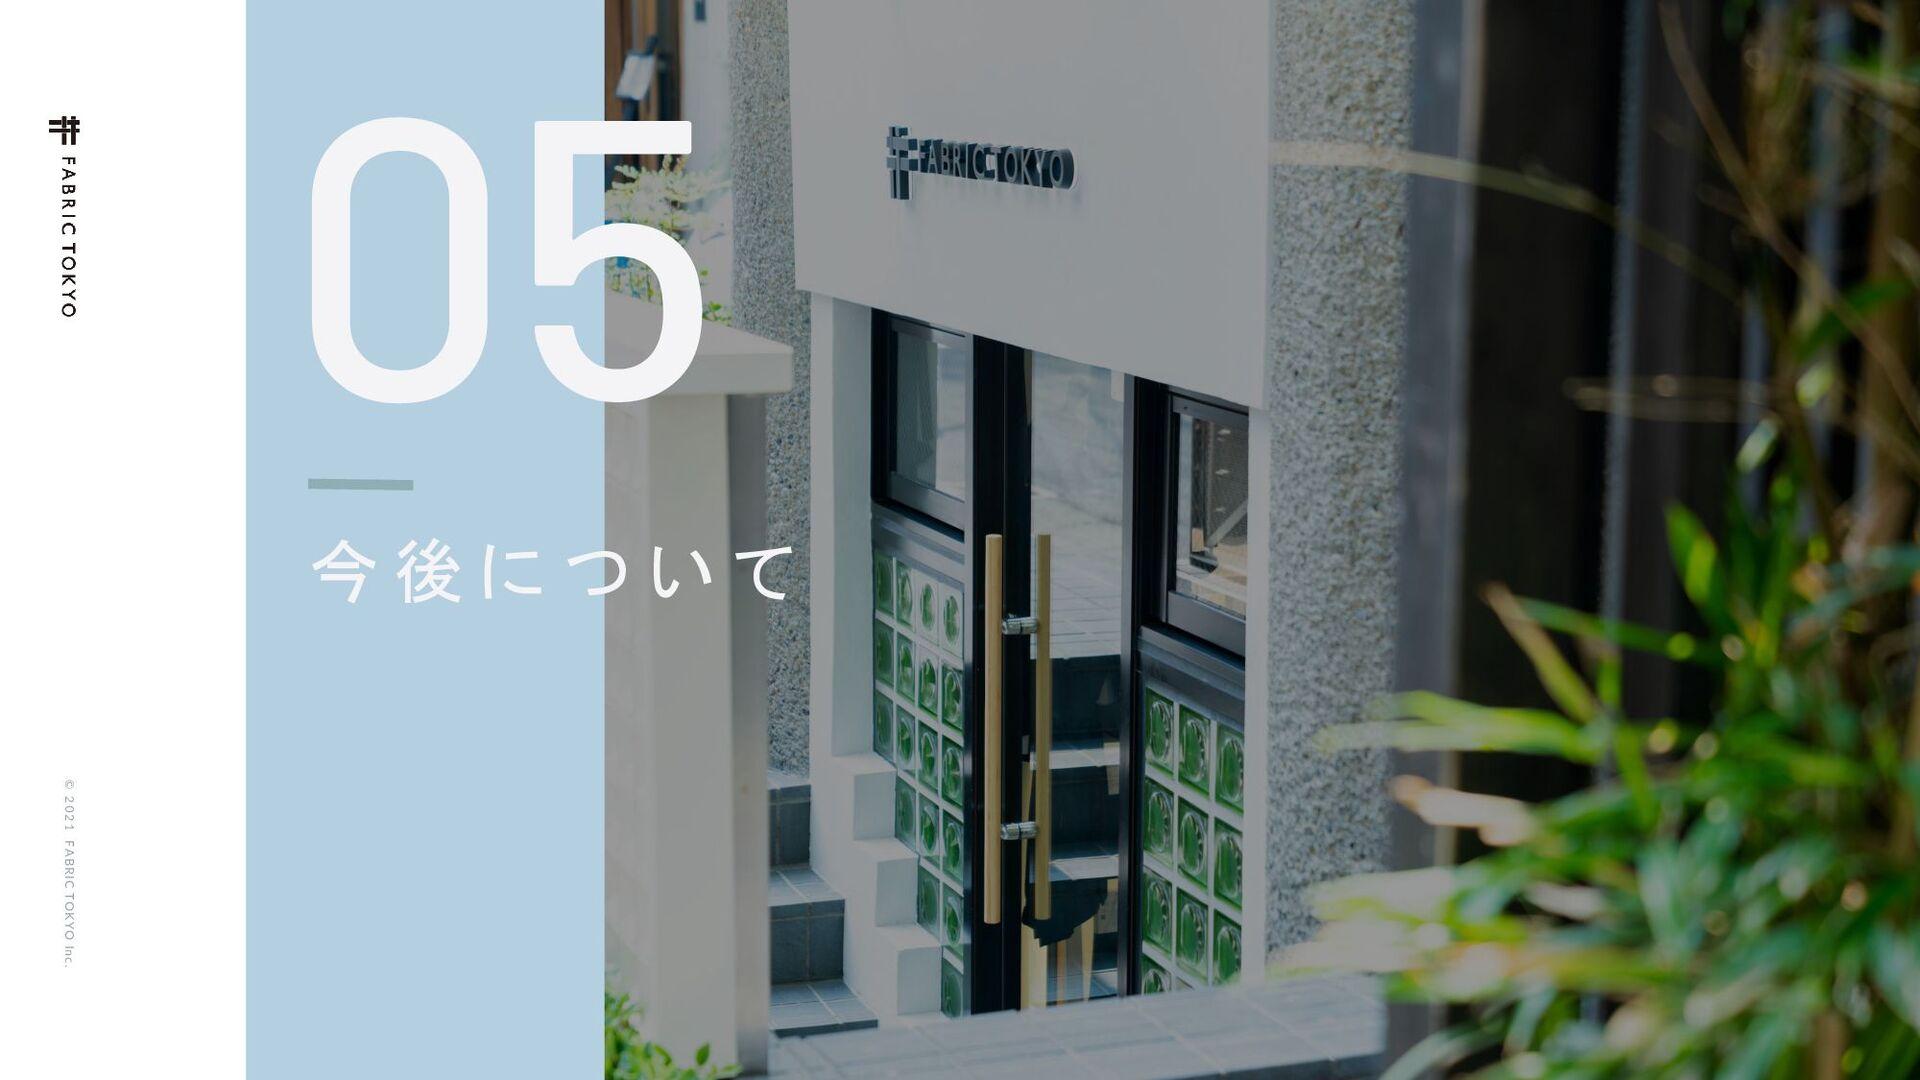 © 2021 FABRIC TOKYO Inc. 51 ΧελϚʔδϟʔχʔ  ڵຯ ൺֱ...